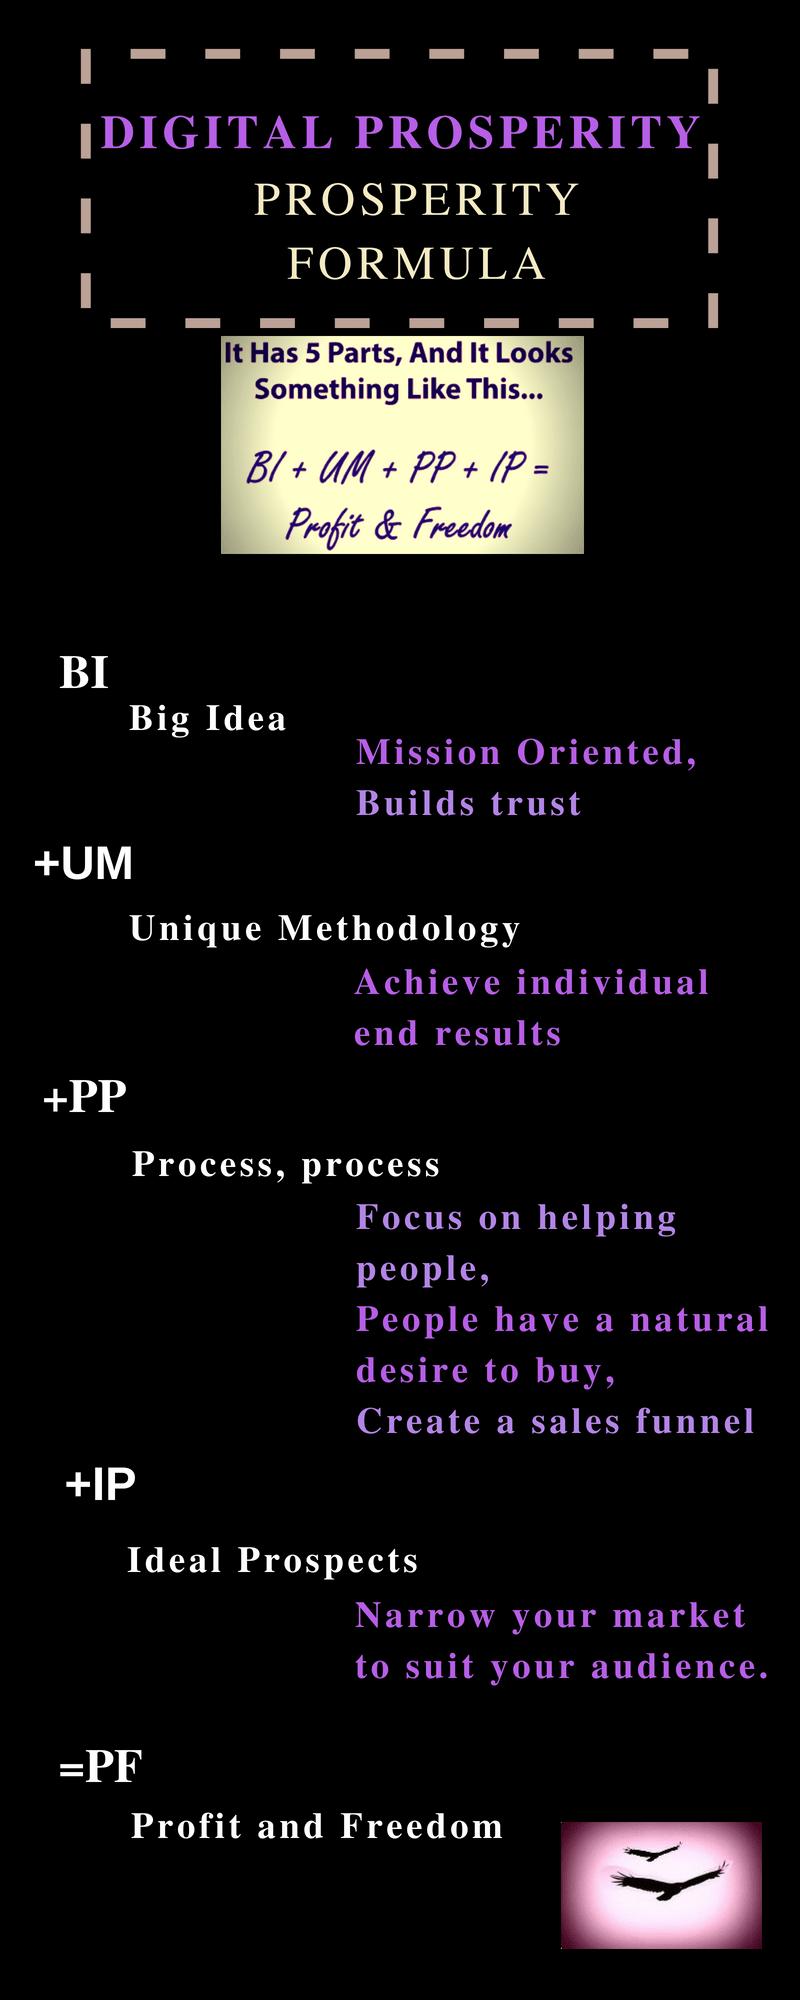 The Prosperity Formula